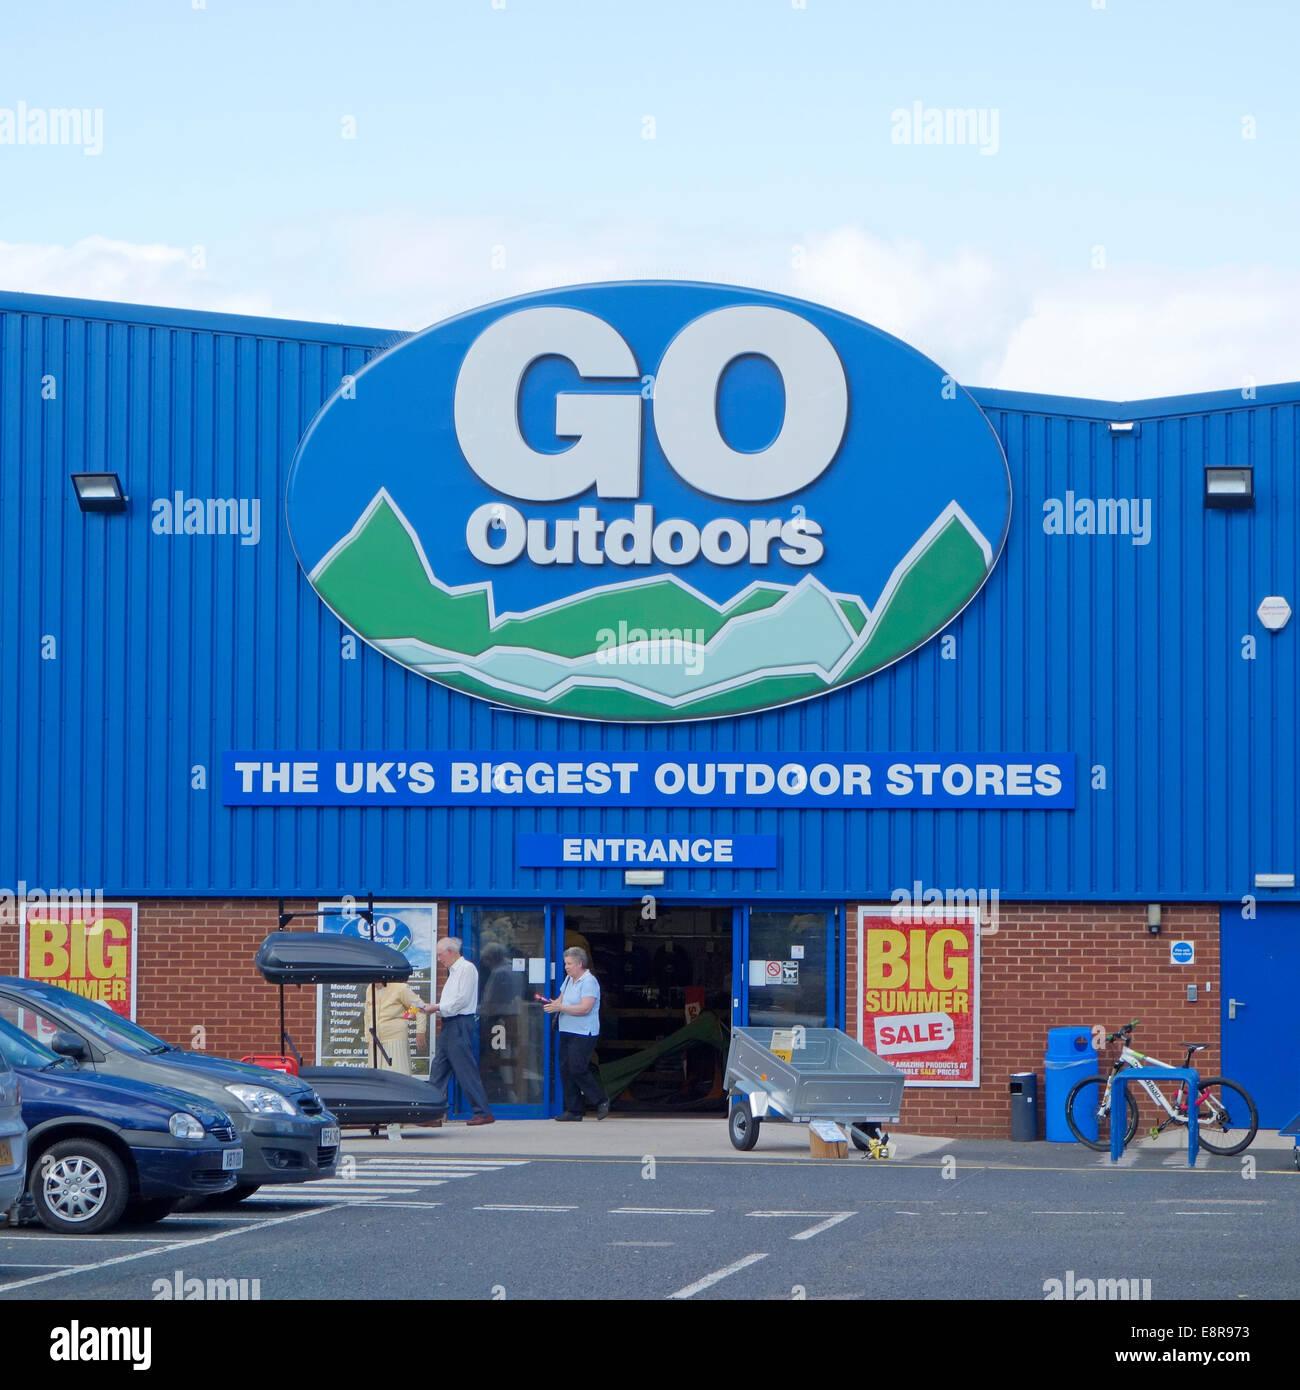 Go Outdoor Store, Hoo Farm Industrial Estate, Kidderminster, Worcestershire, England, UK - Stock Image